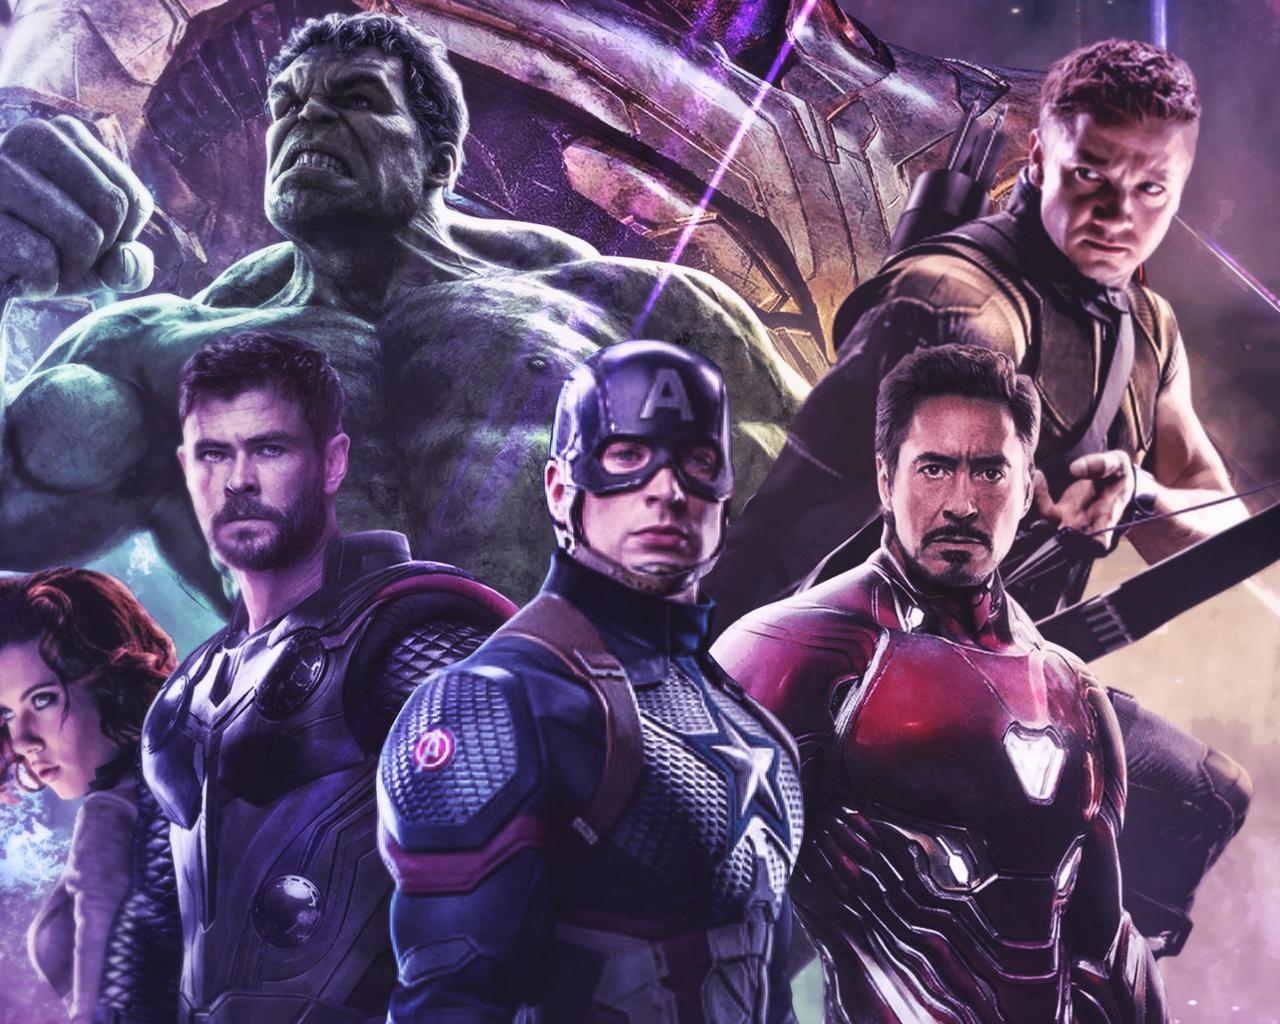 1280x1024 88 Avengers Endgame 1280x1024 Resolution Hd 4k Wallpapers